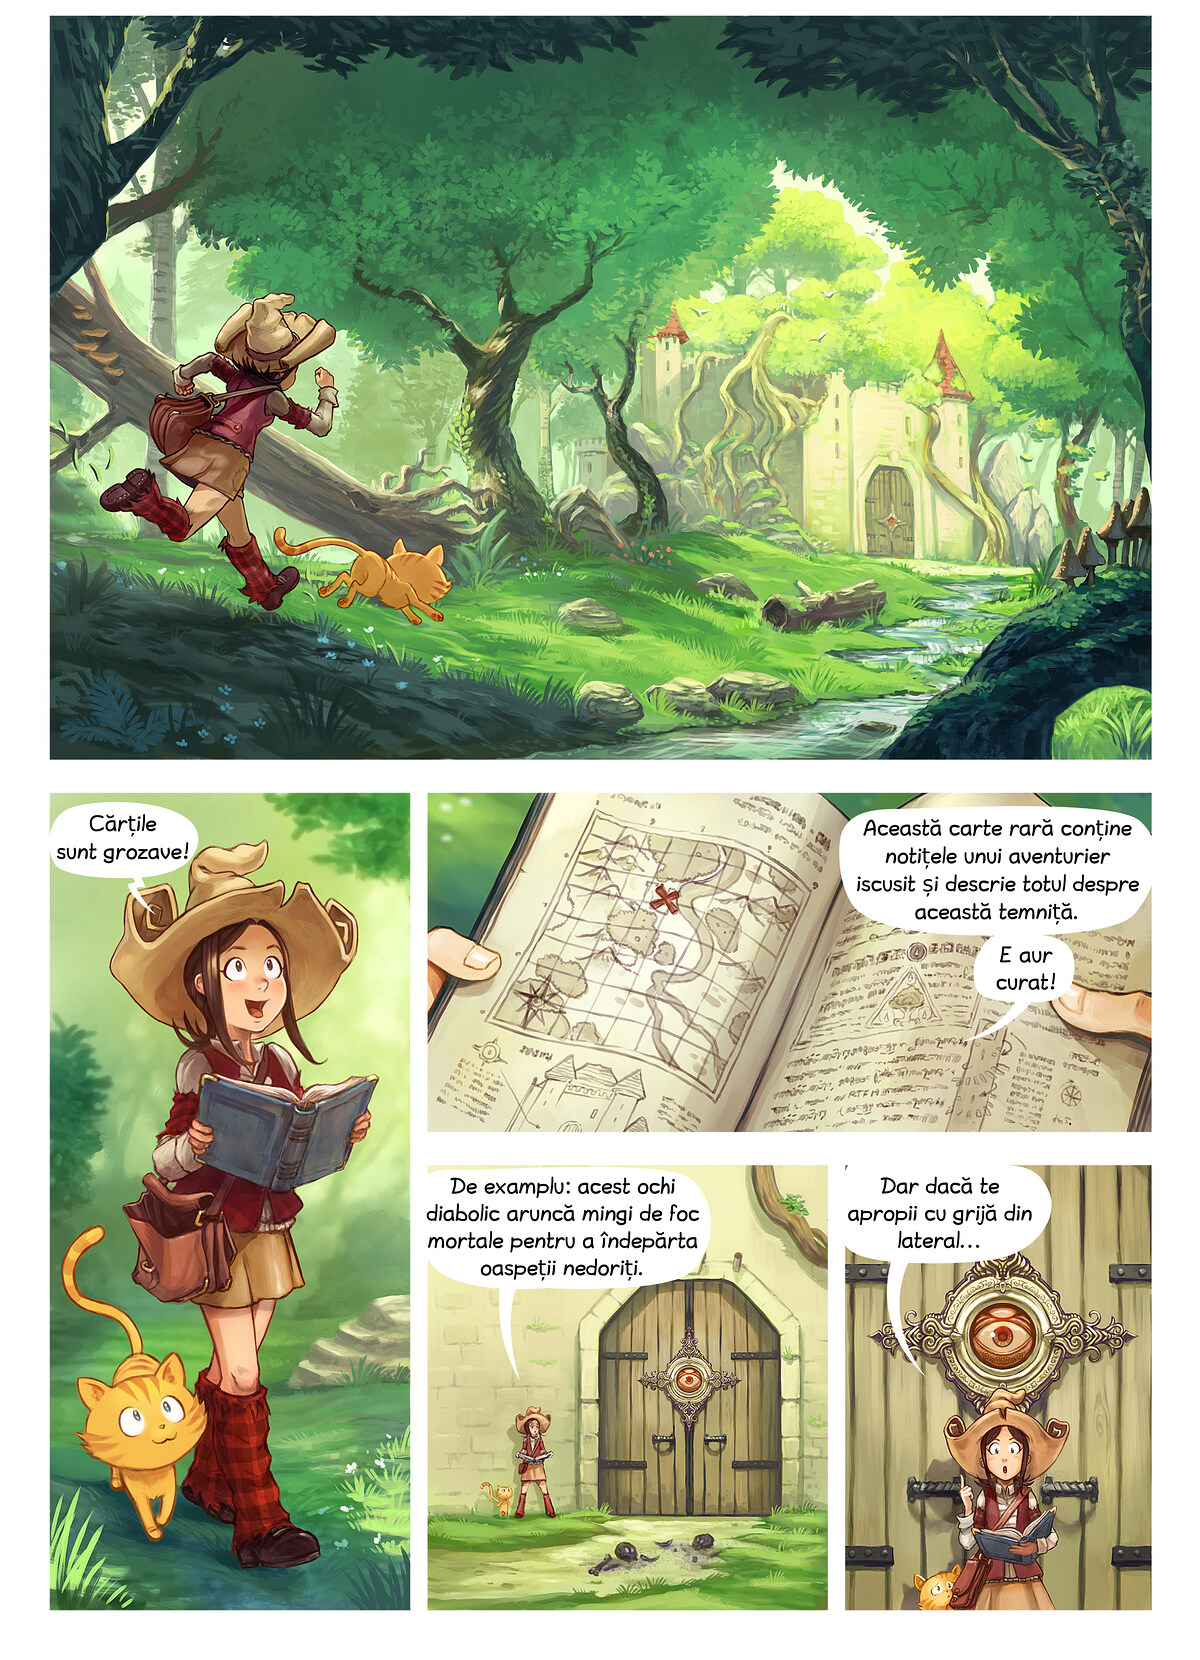 Episodul 26: Cărțile sunt grozave, Page 1